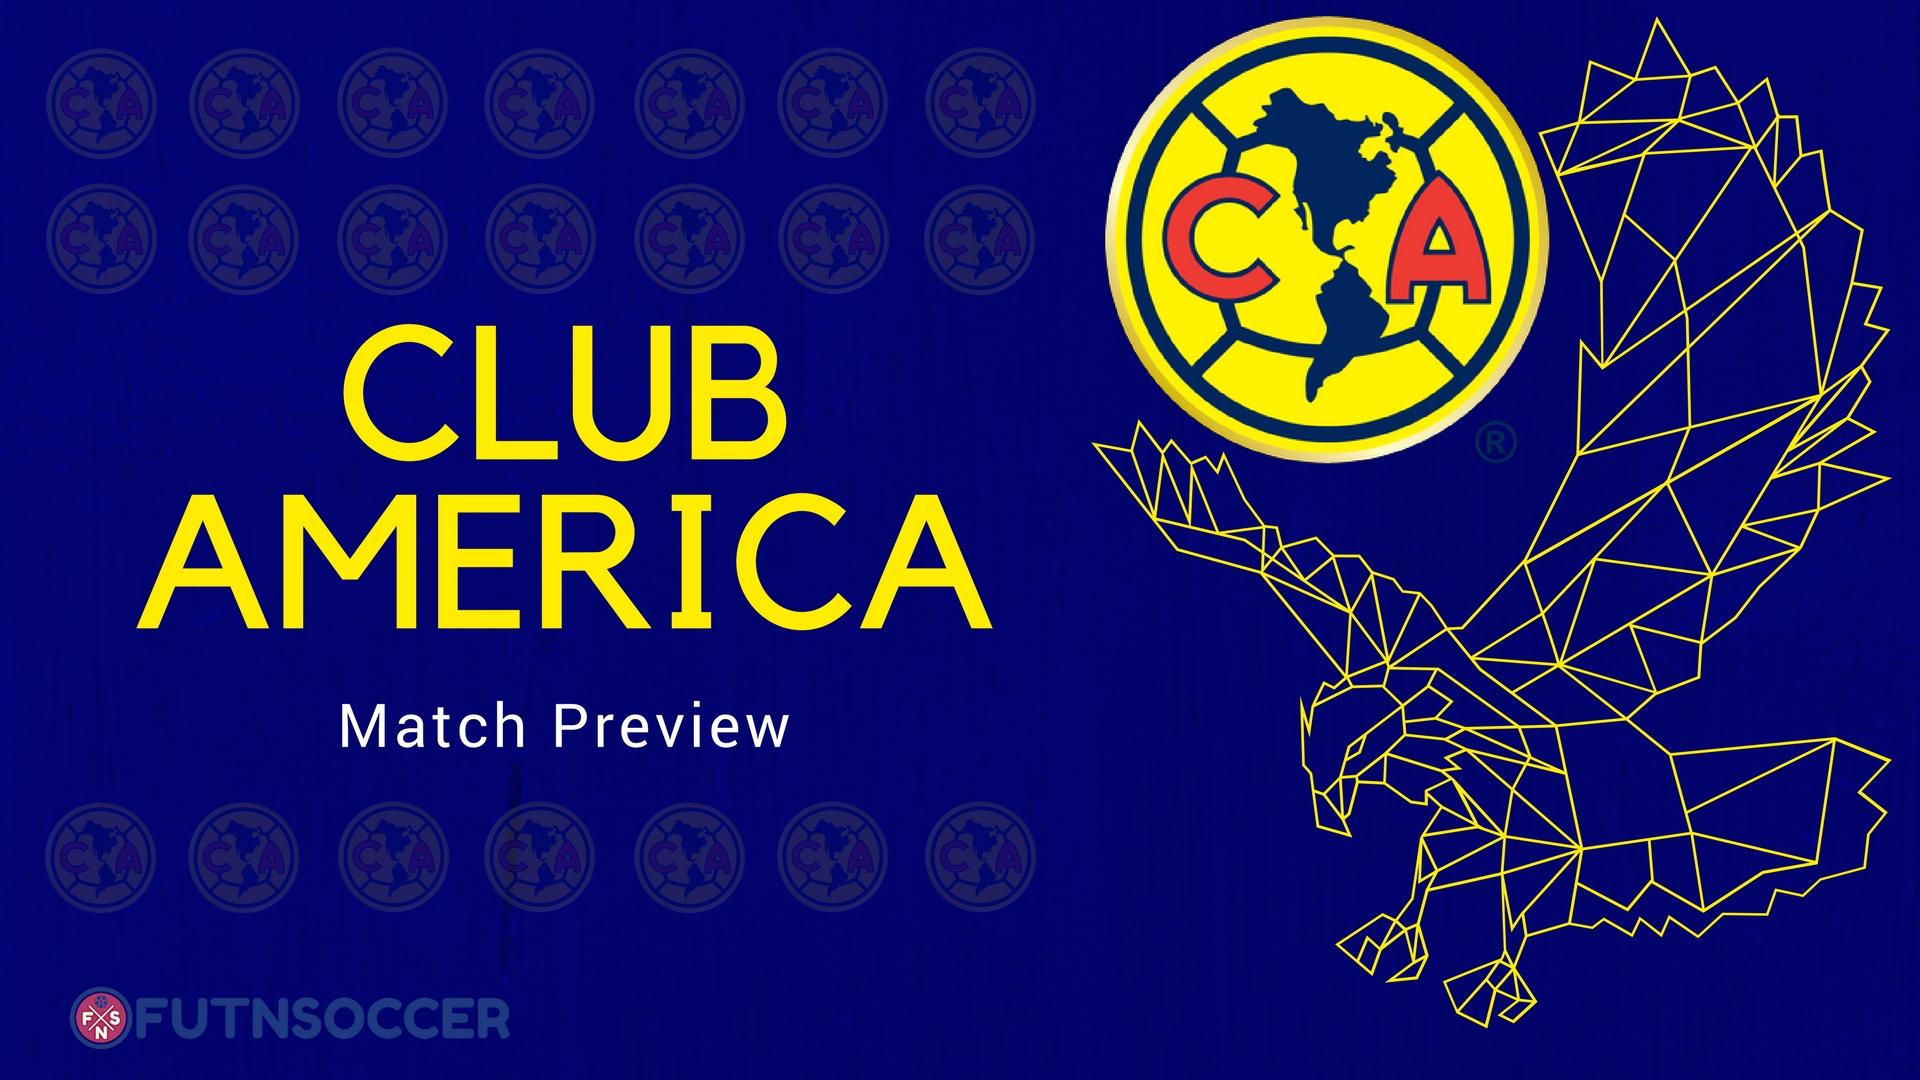 Club America vs Chivas Live TV Online Info- Where to Watch, Preview